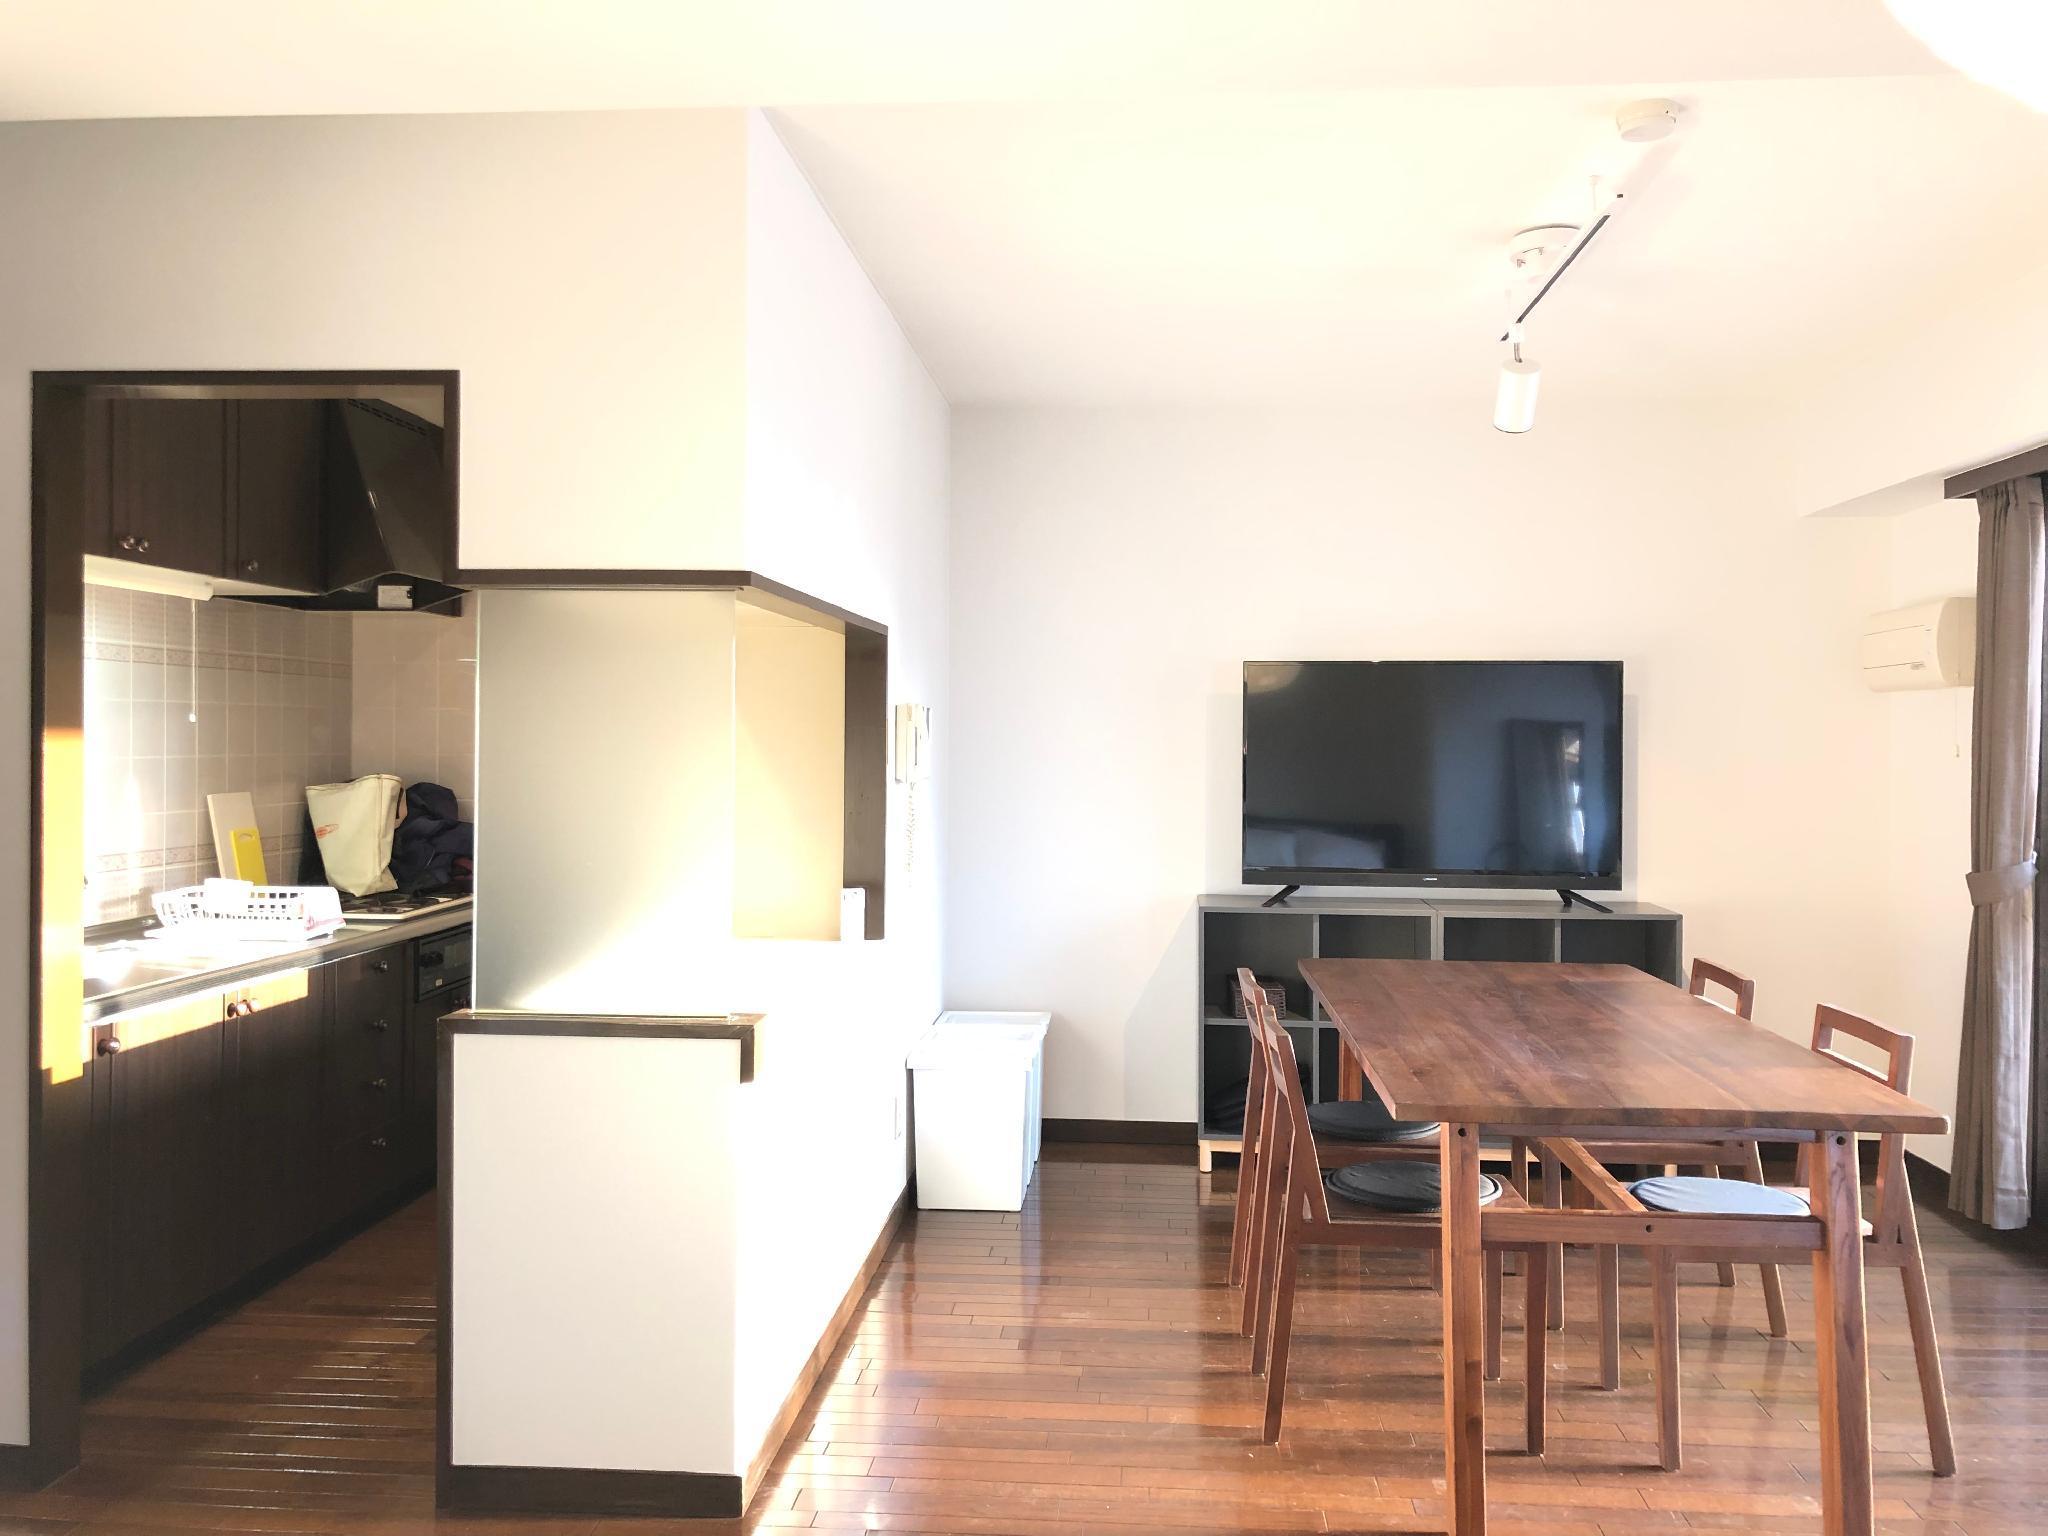 C61 1 Bedroom Apartment In Sapporo